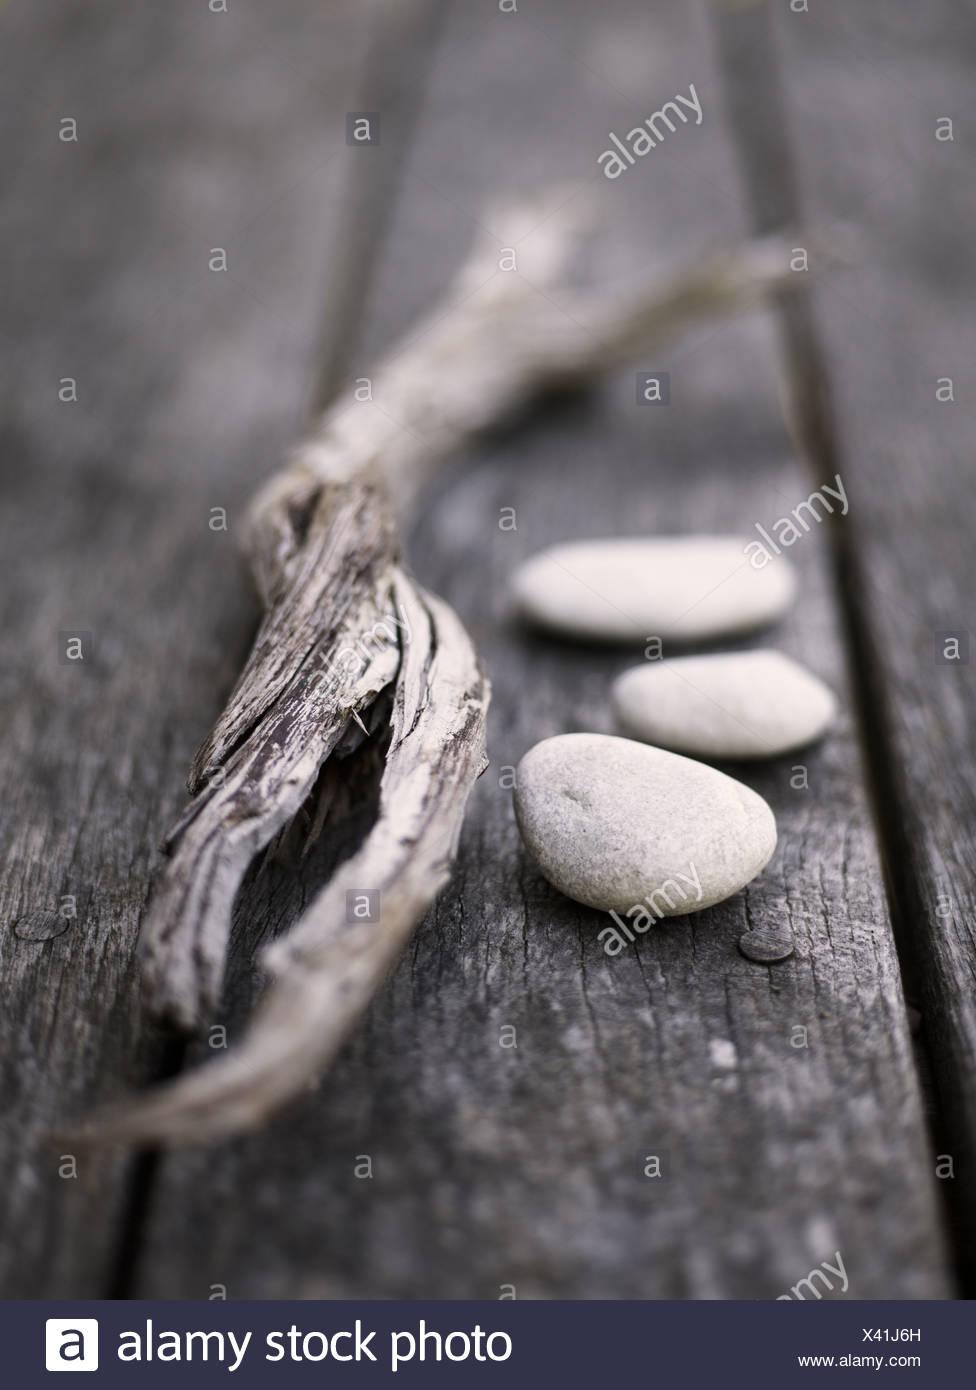 Scandinavia, Sweden, Gotland, Driftwood and pebbles, close-up - Stock Image